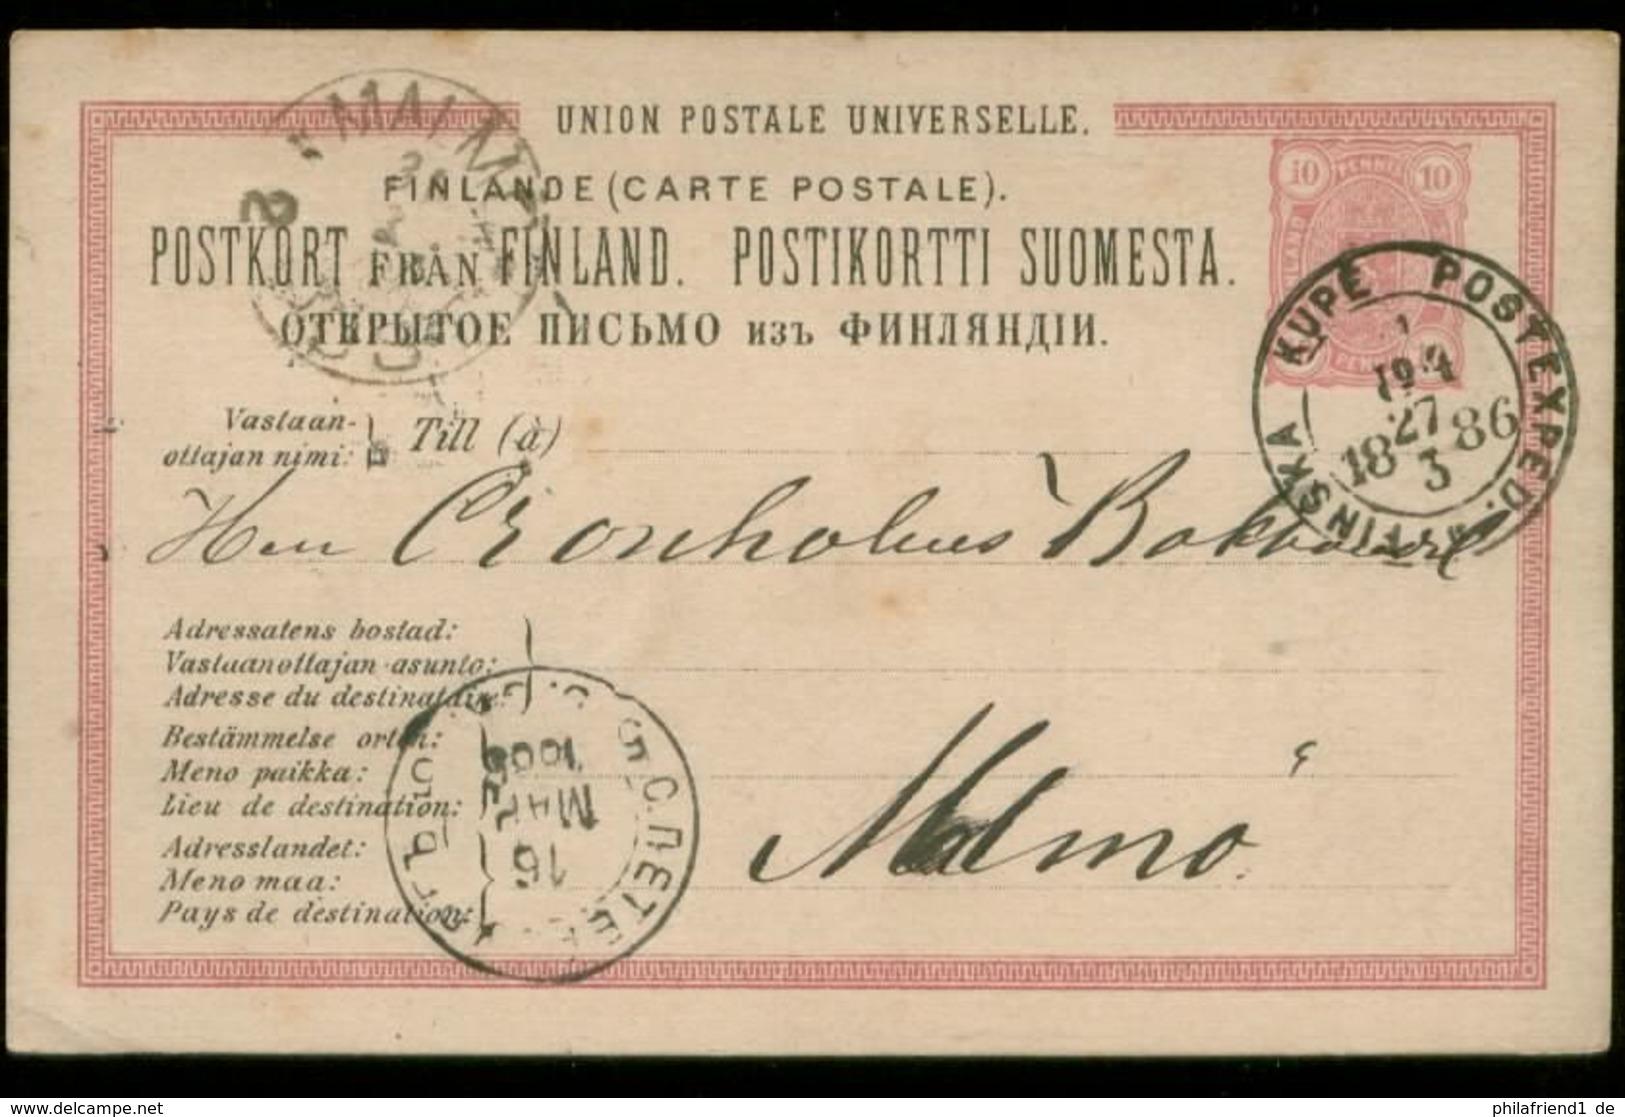 S8247 Finnland GS Postkarte : Gebraucht Kupe - Malmö 1886 , Bedarfserhaltung. - Postal Stationery